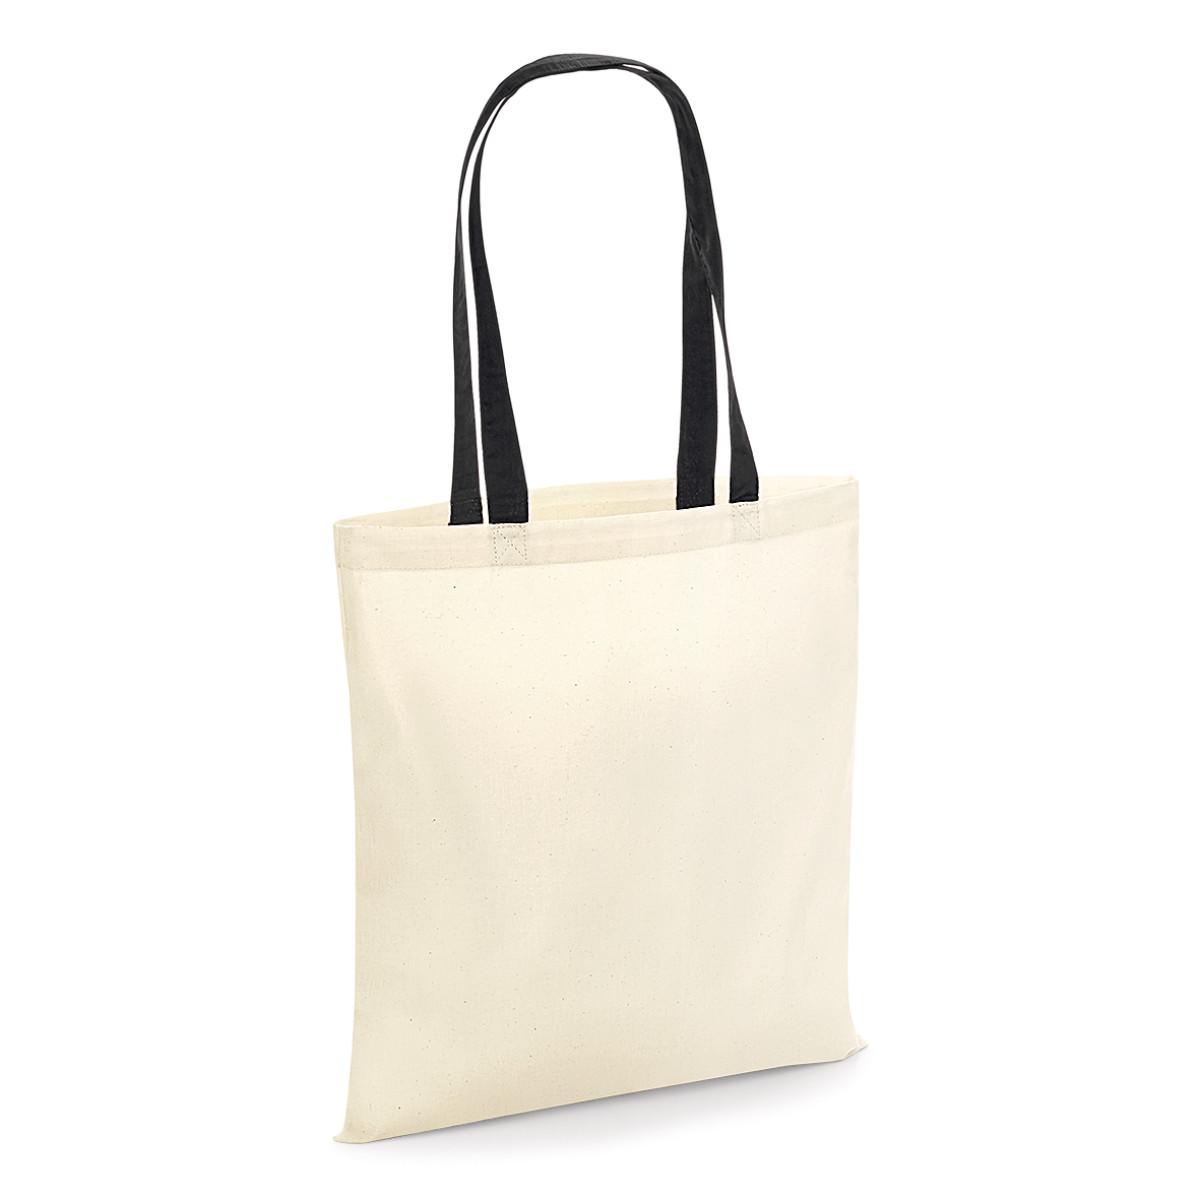 Westford Mill Bag 4 Life Contrast Handle